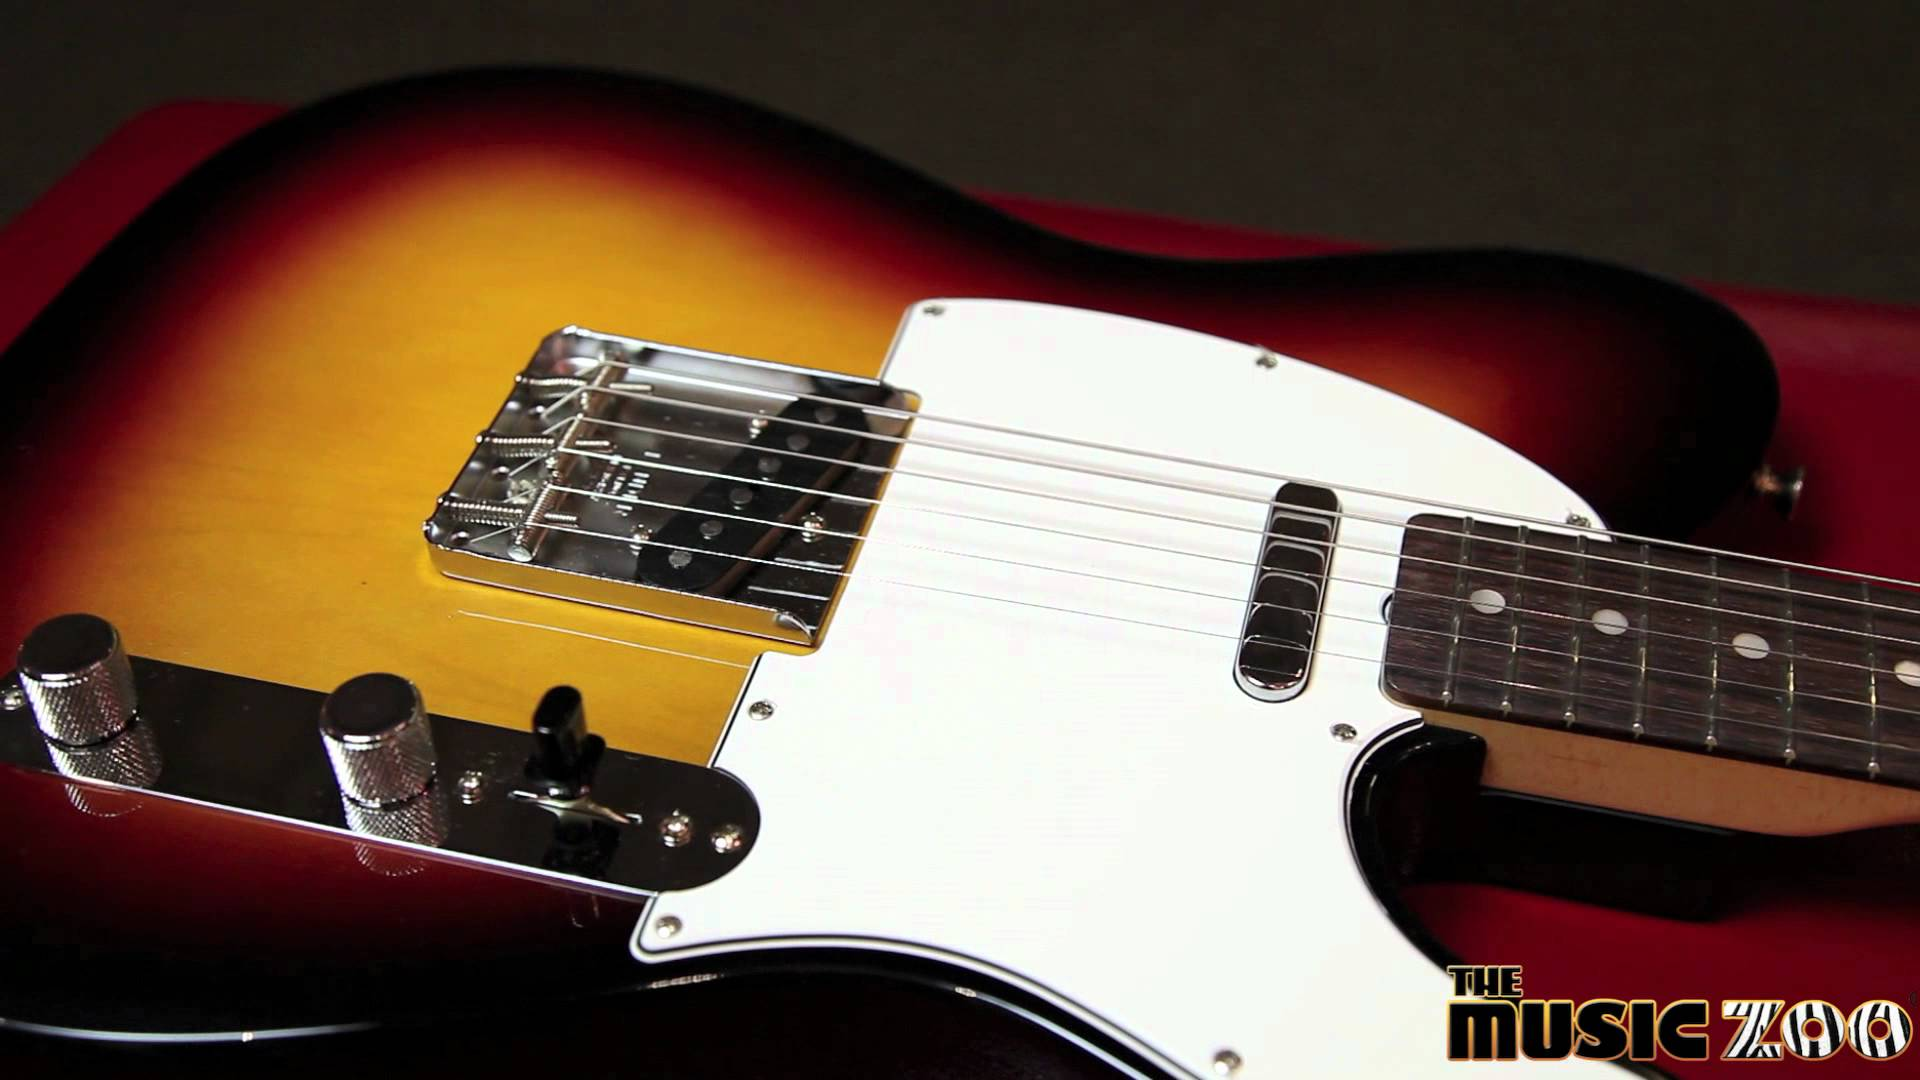 Fender American Vintage Telecaster Electric Guitar 1920x1080